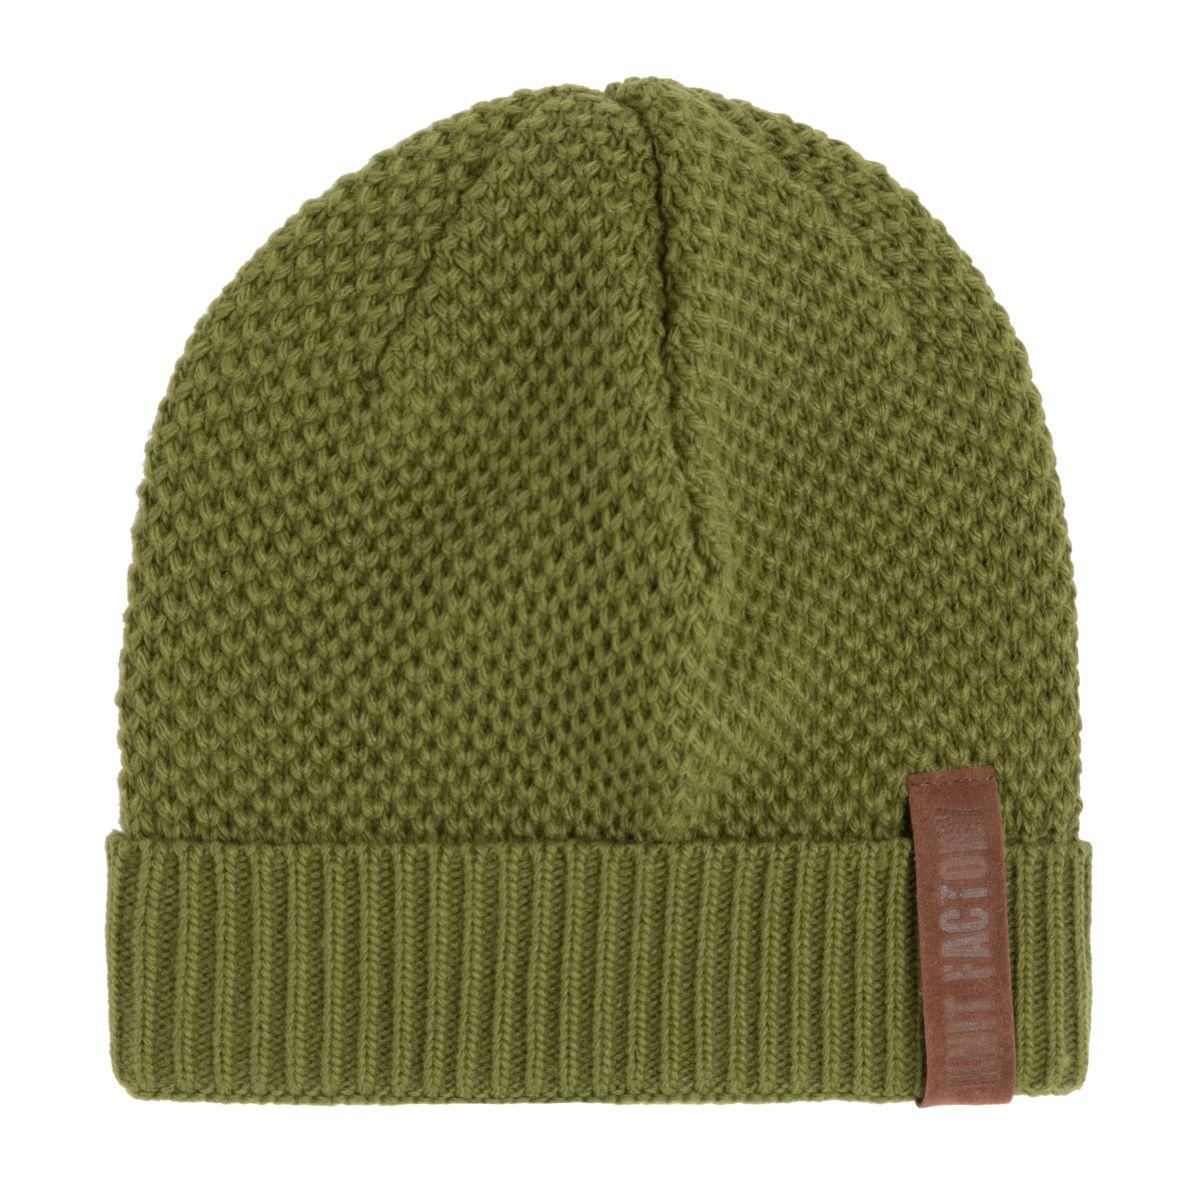 jazz beanie moss green